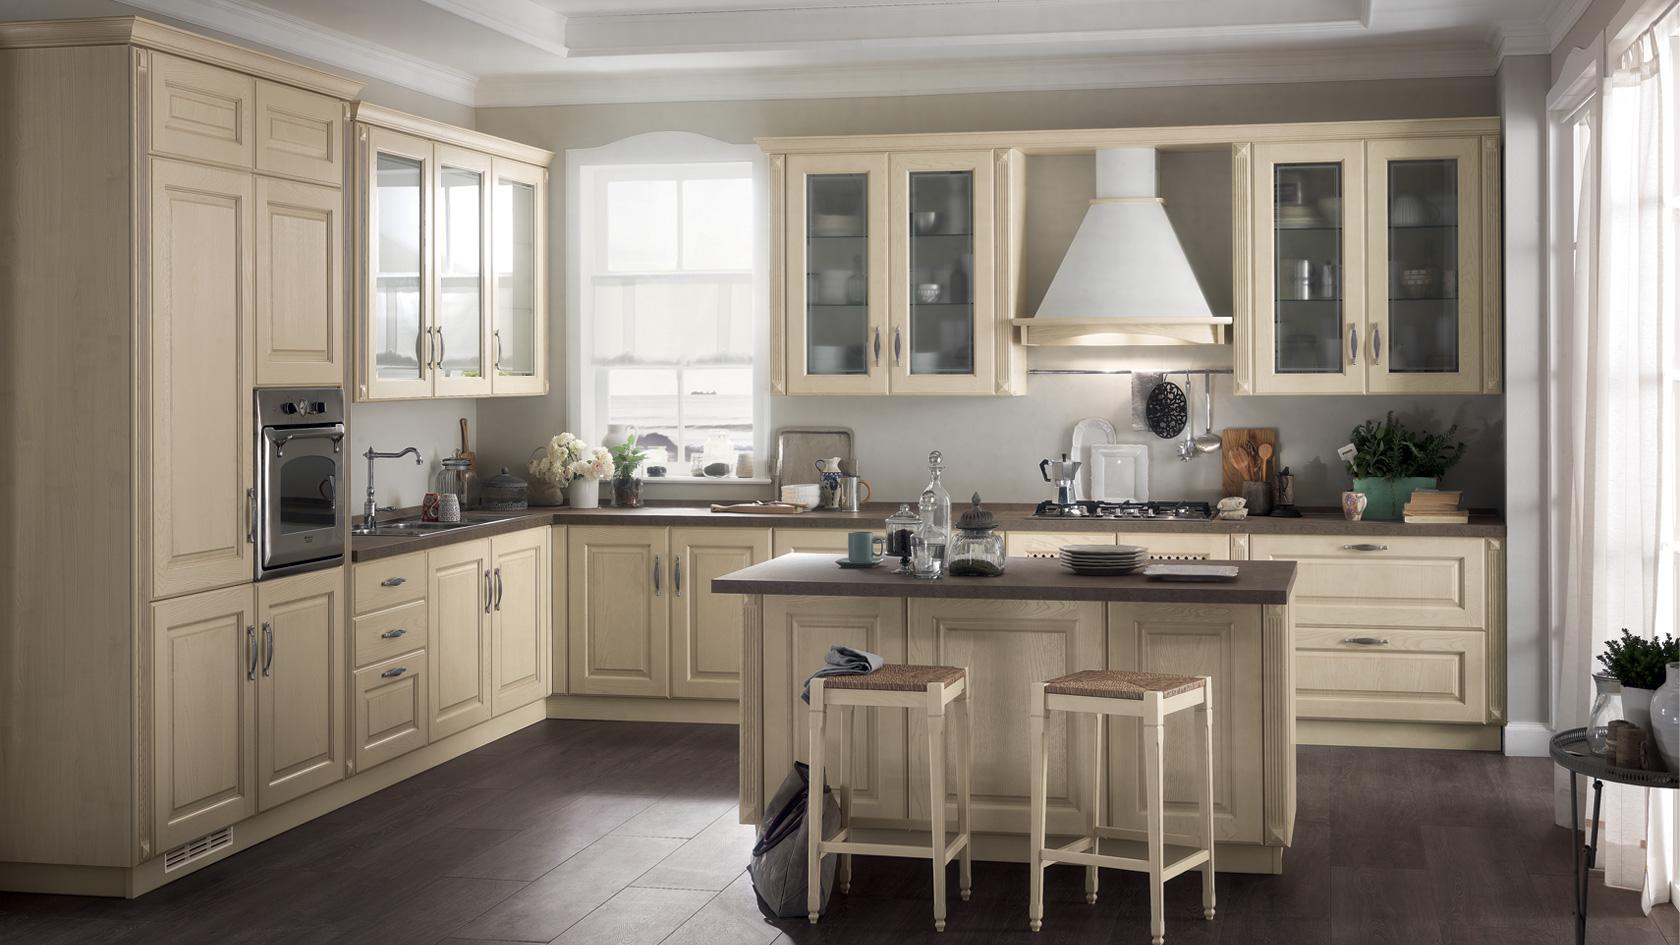 Cucina Scavolini Madeleine chiara